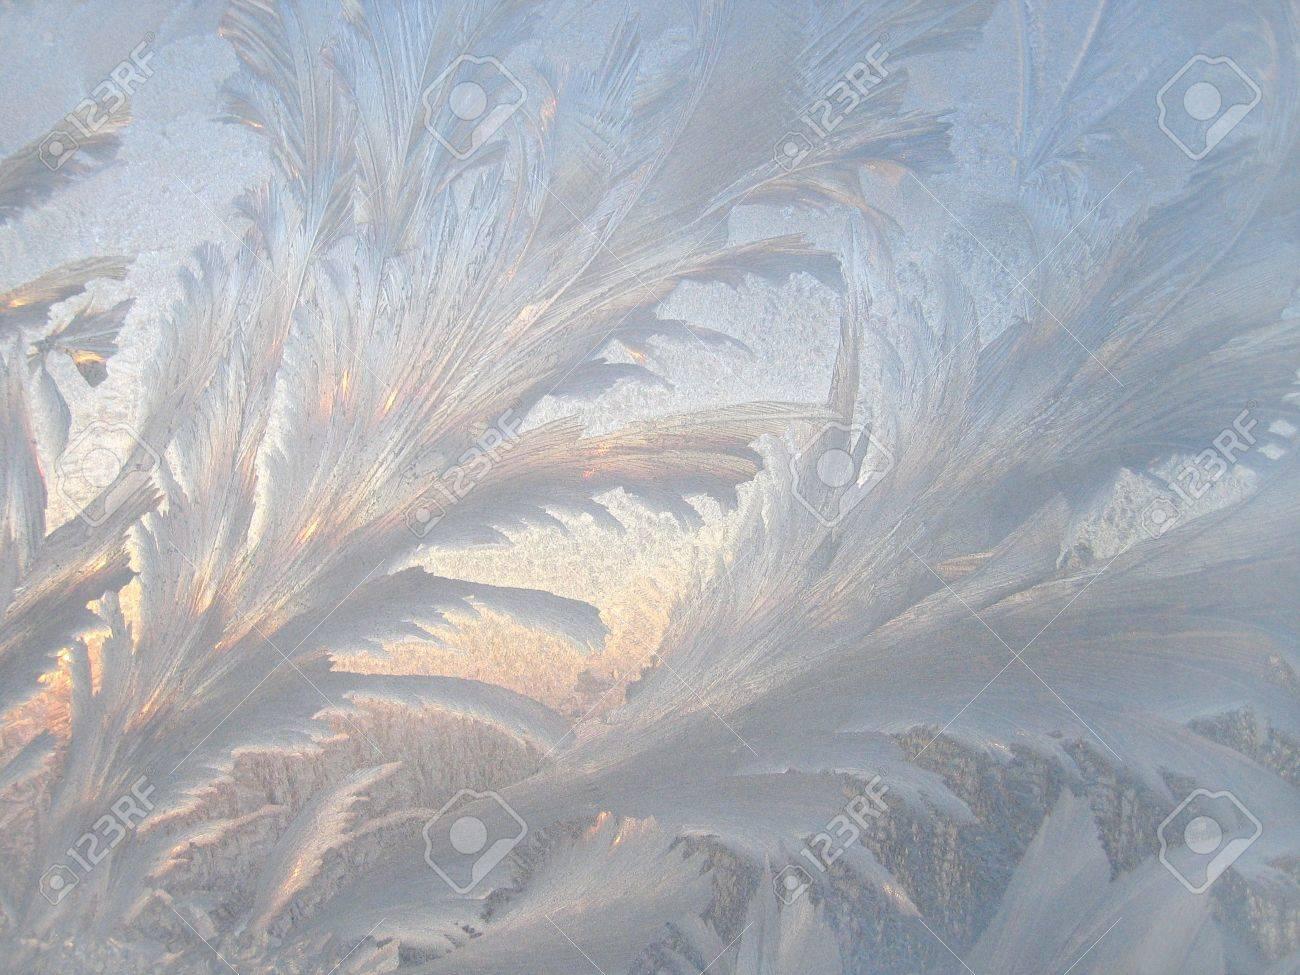 winter glass - 6062760